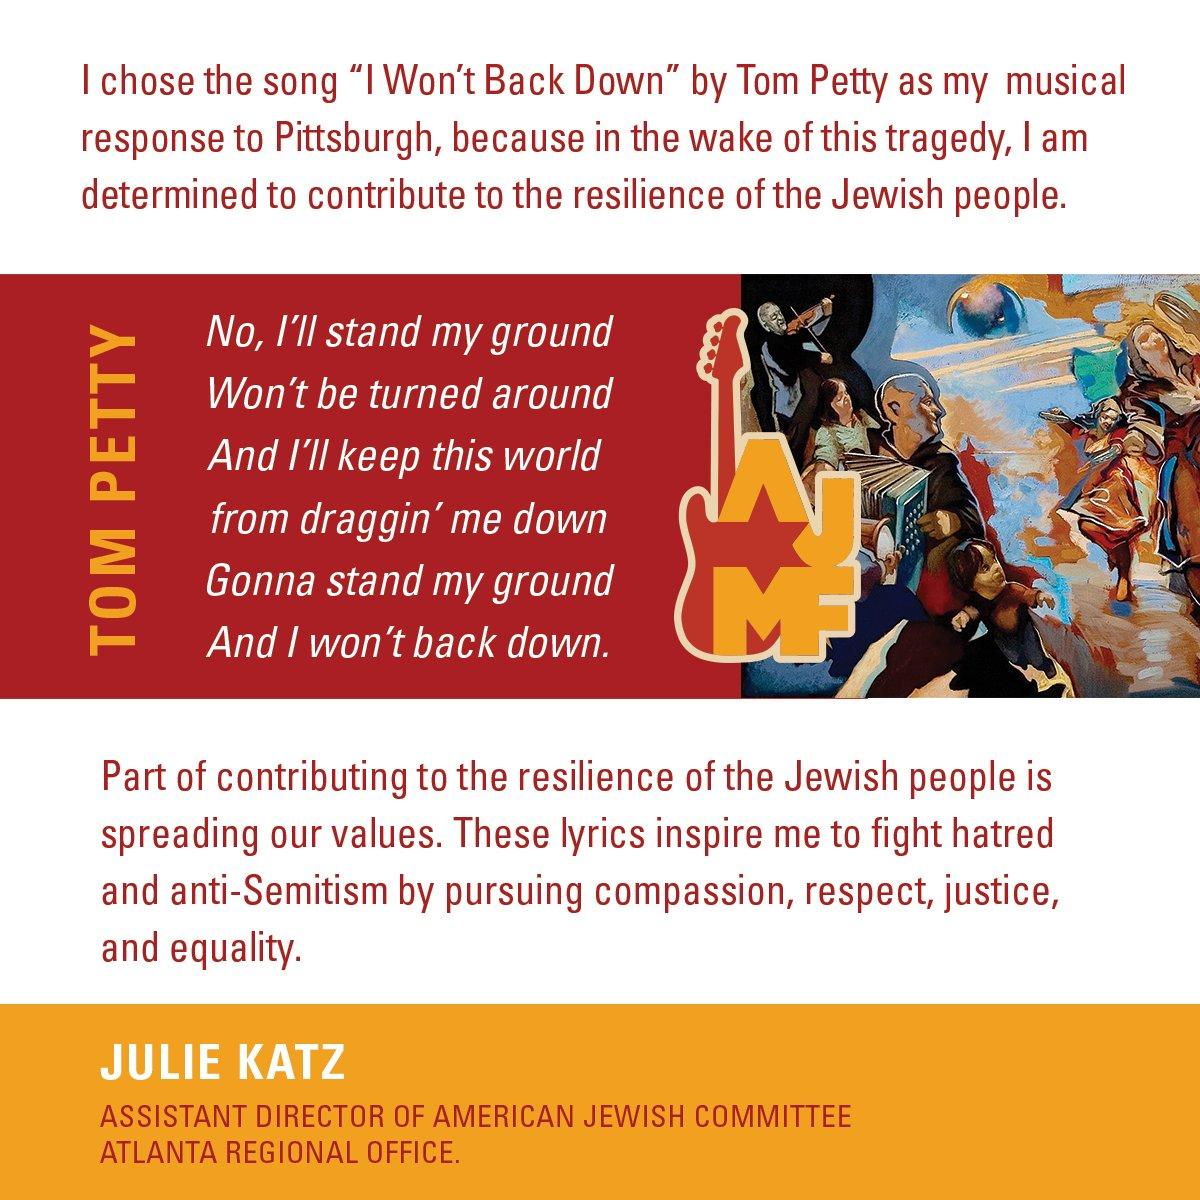 Atlanta Jewish Music Festival (AJMF) on Twitter: